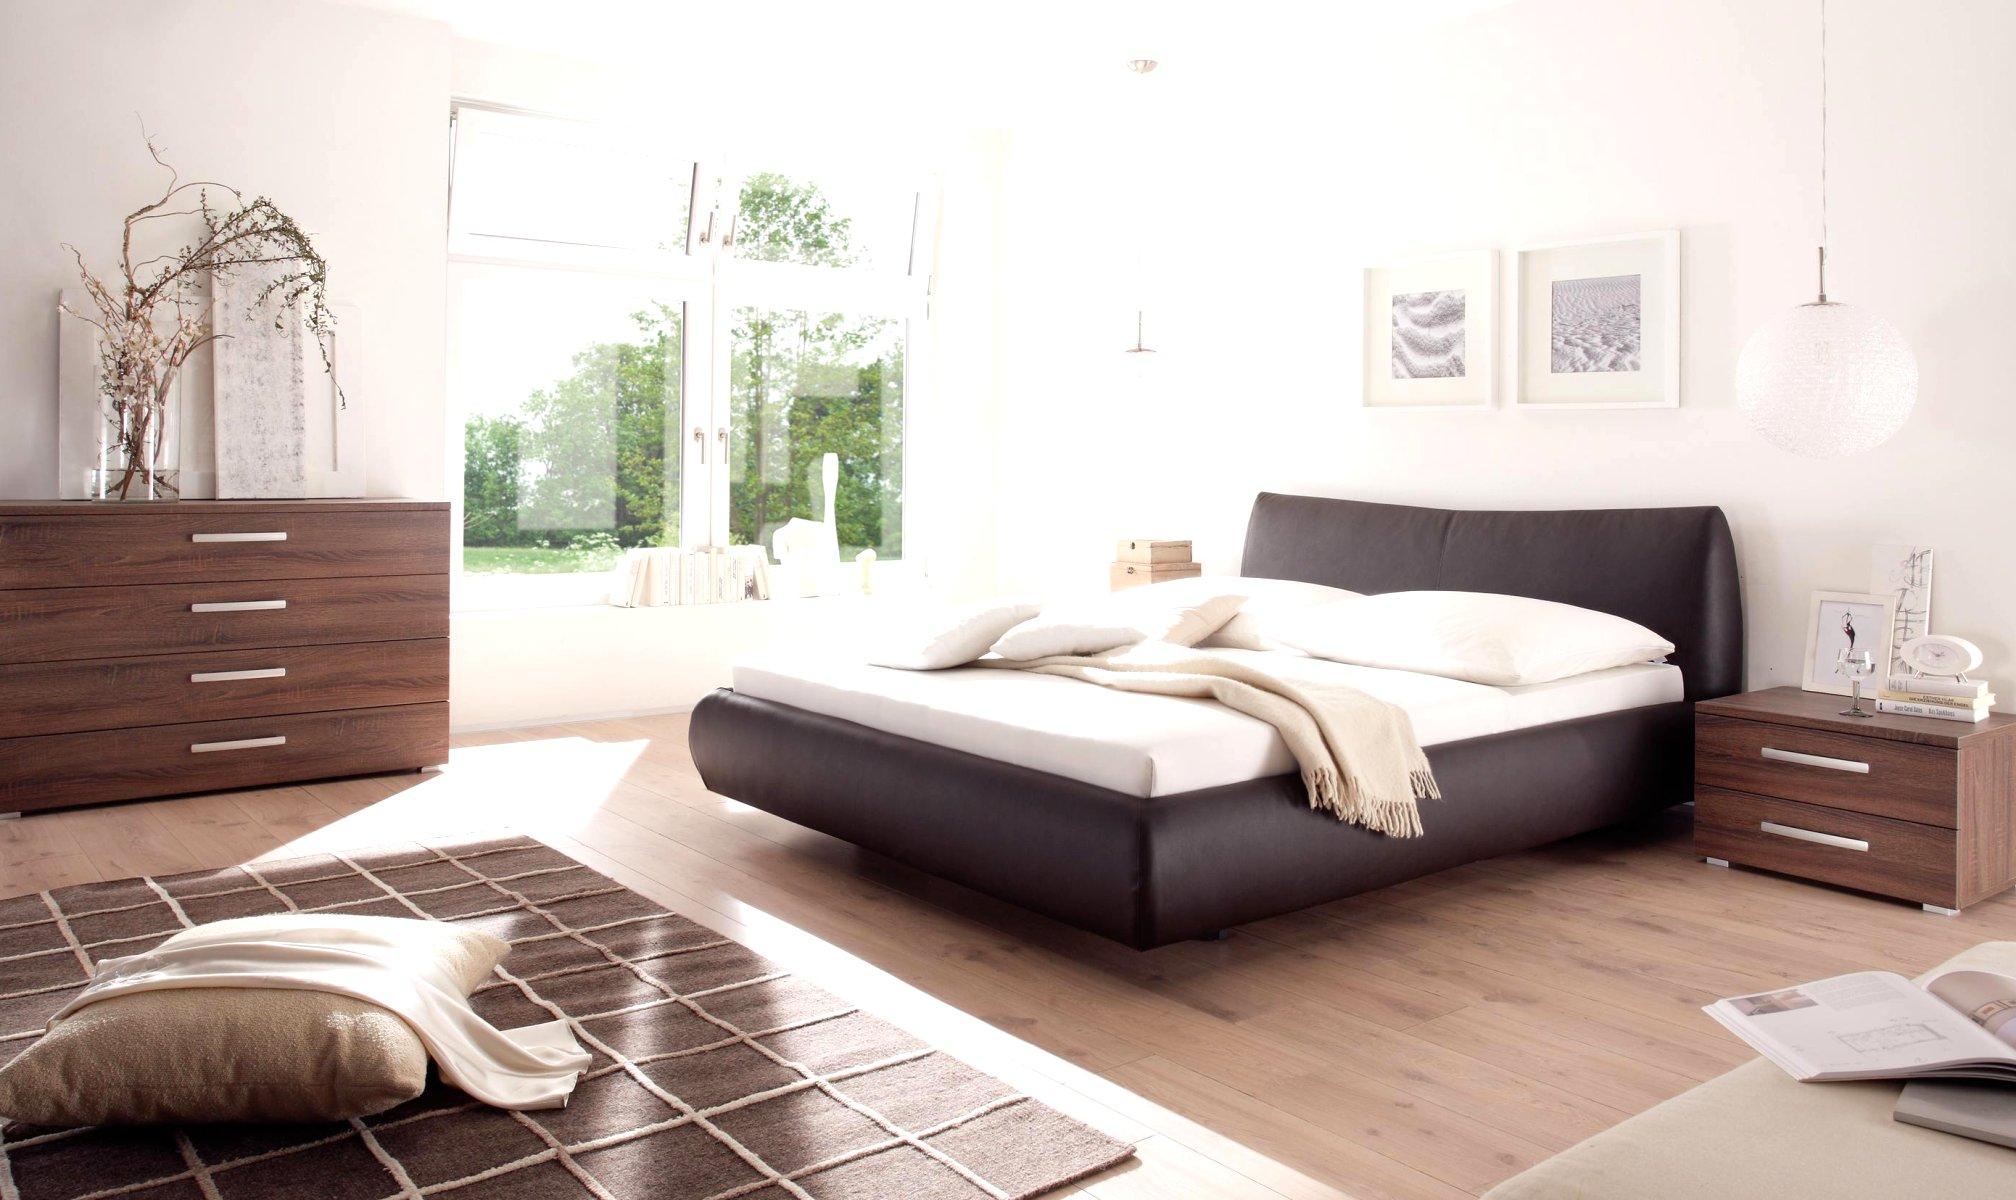 wasserbetten hersteller schlafvergnuegen. Black Bedroom Furniture Sets. Home Design Ideas